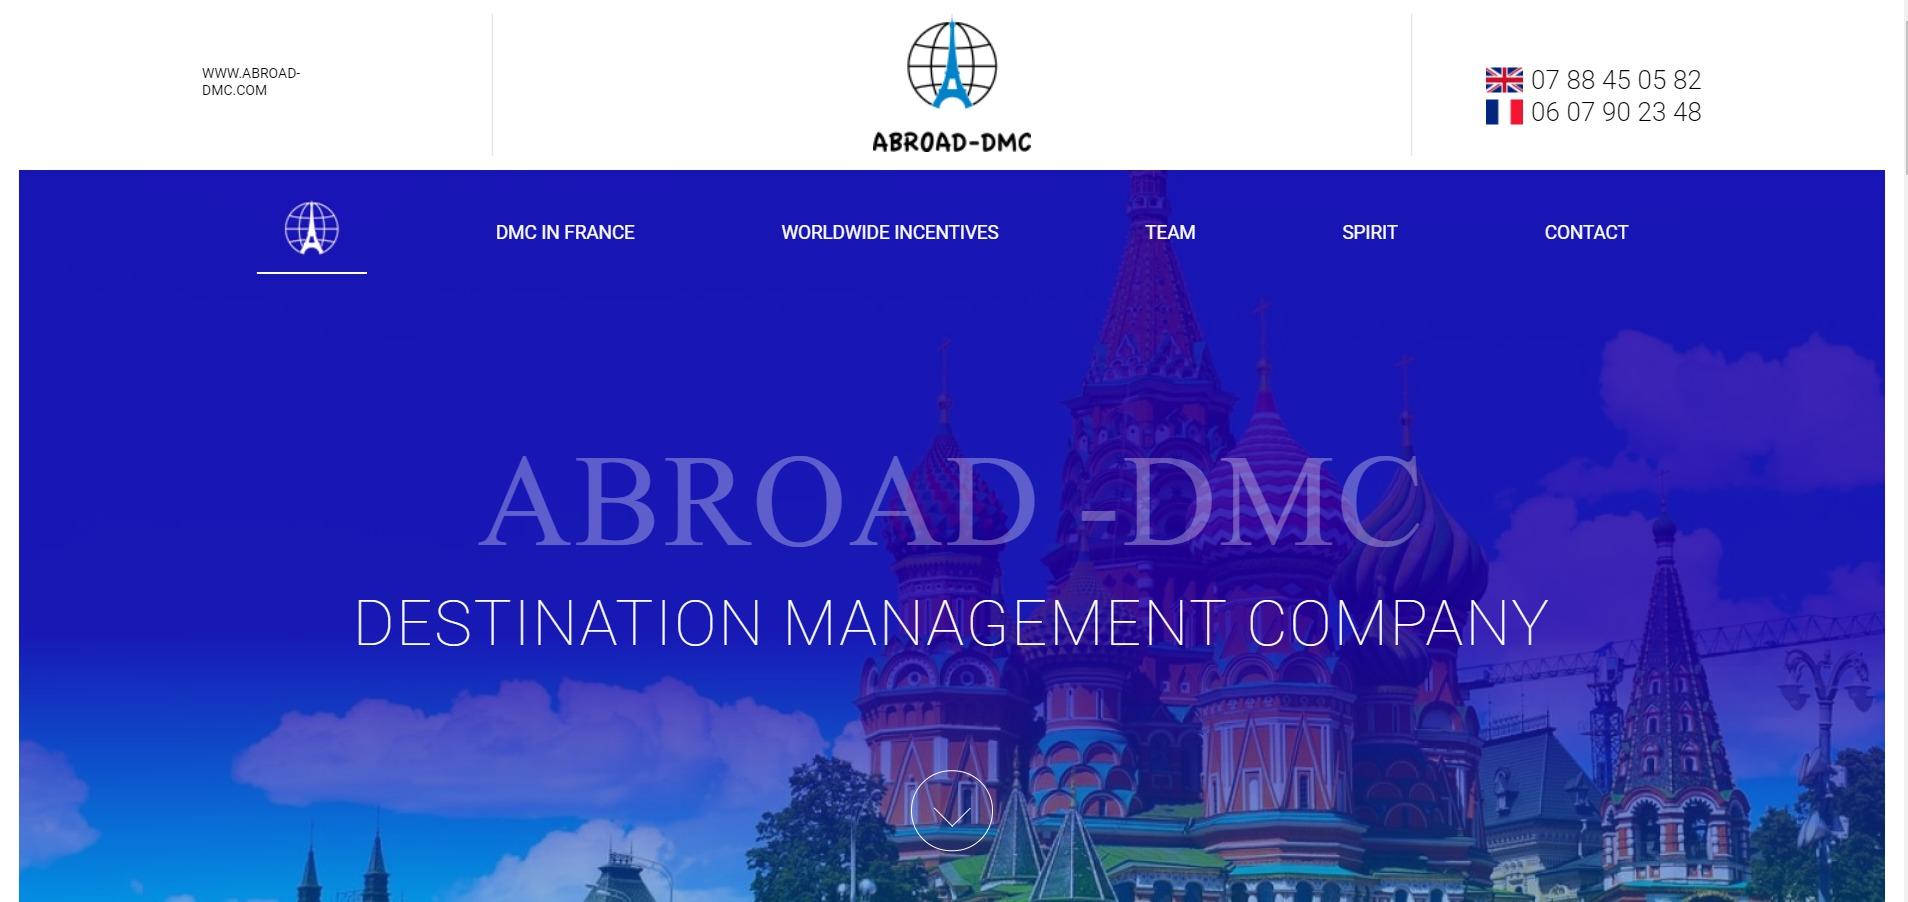 abroad dmc